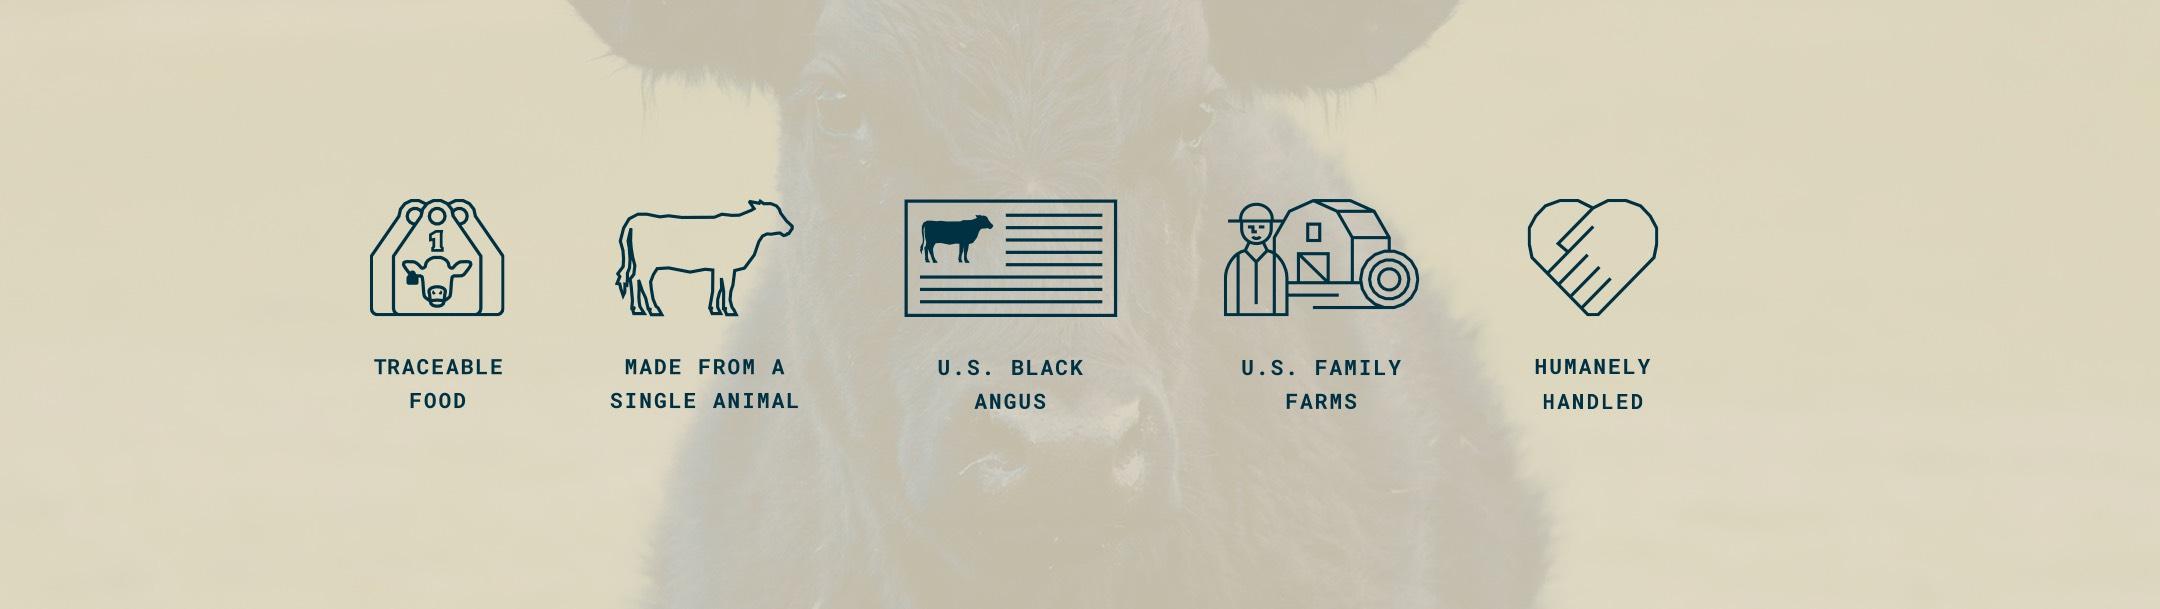 1 source ground beef claim icons